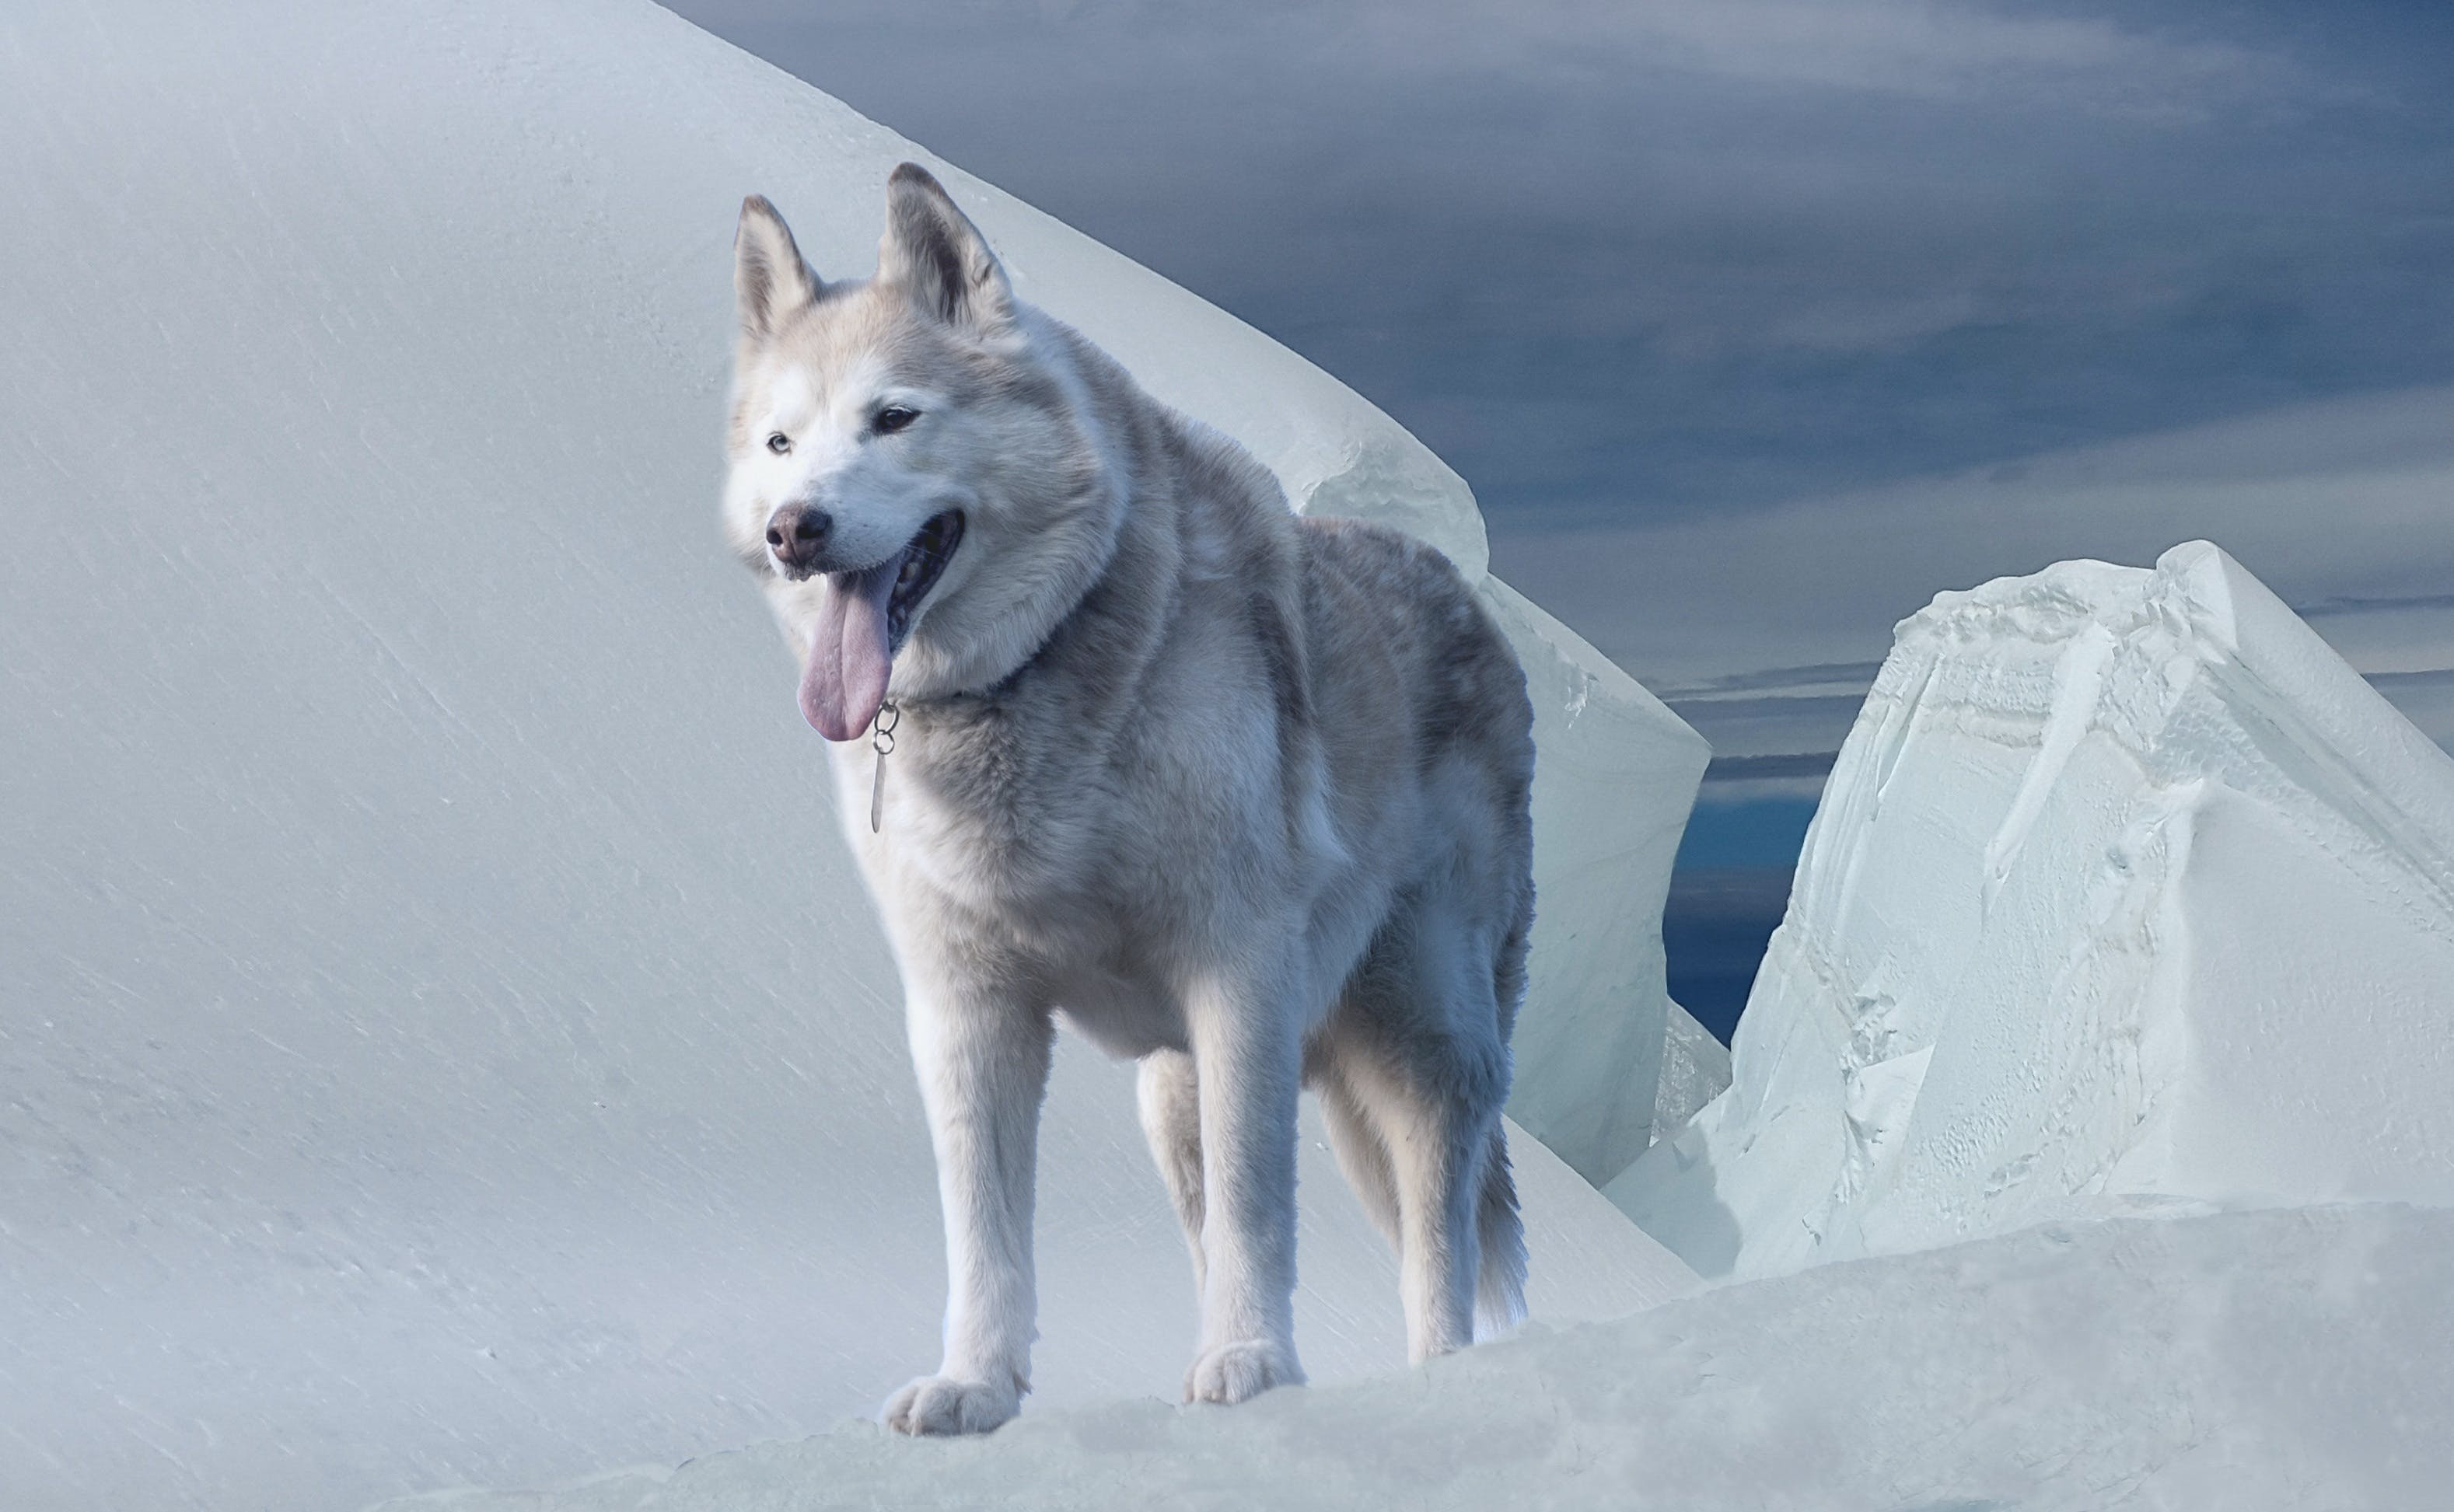 animal, canine, climate